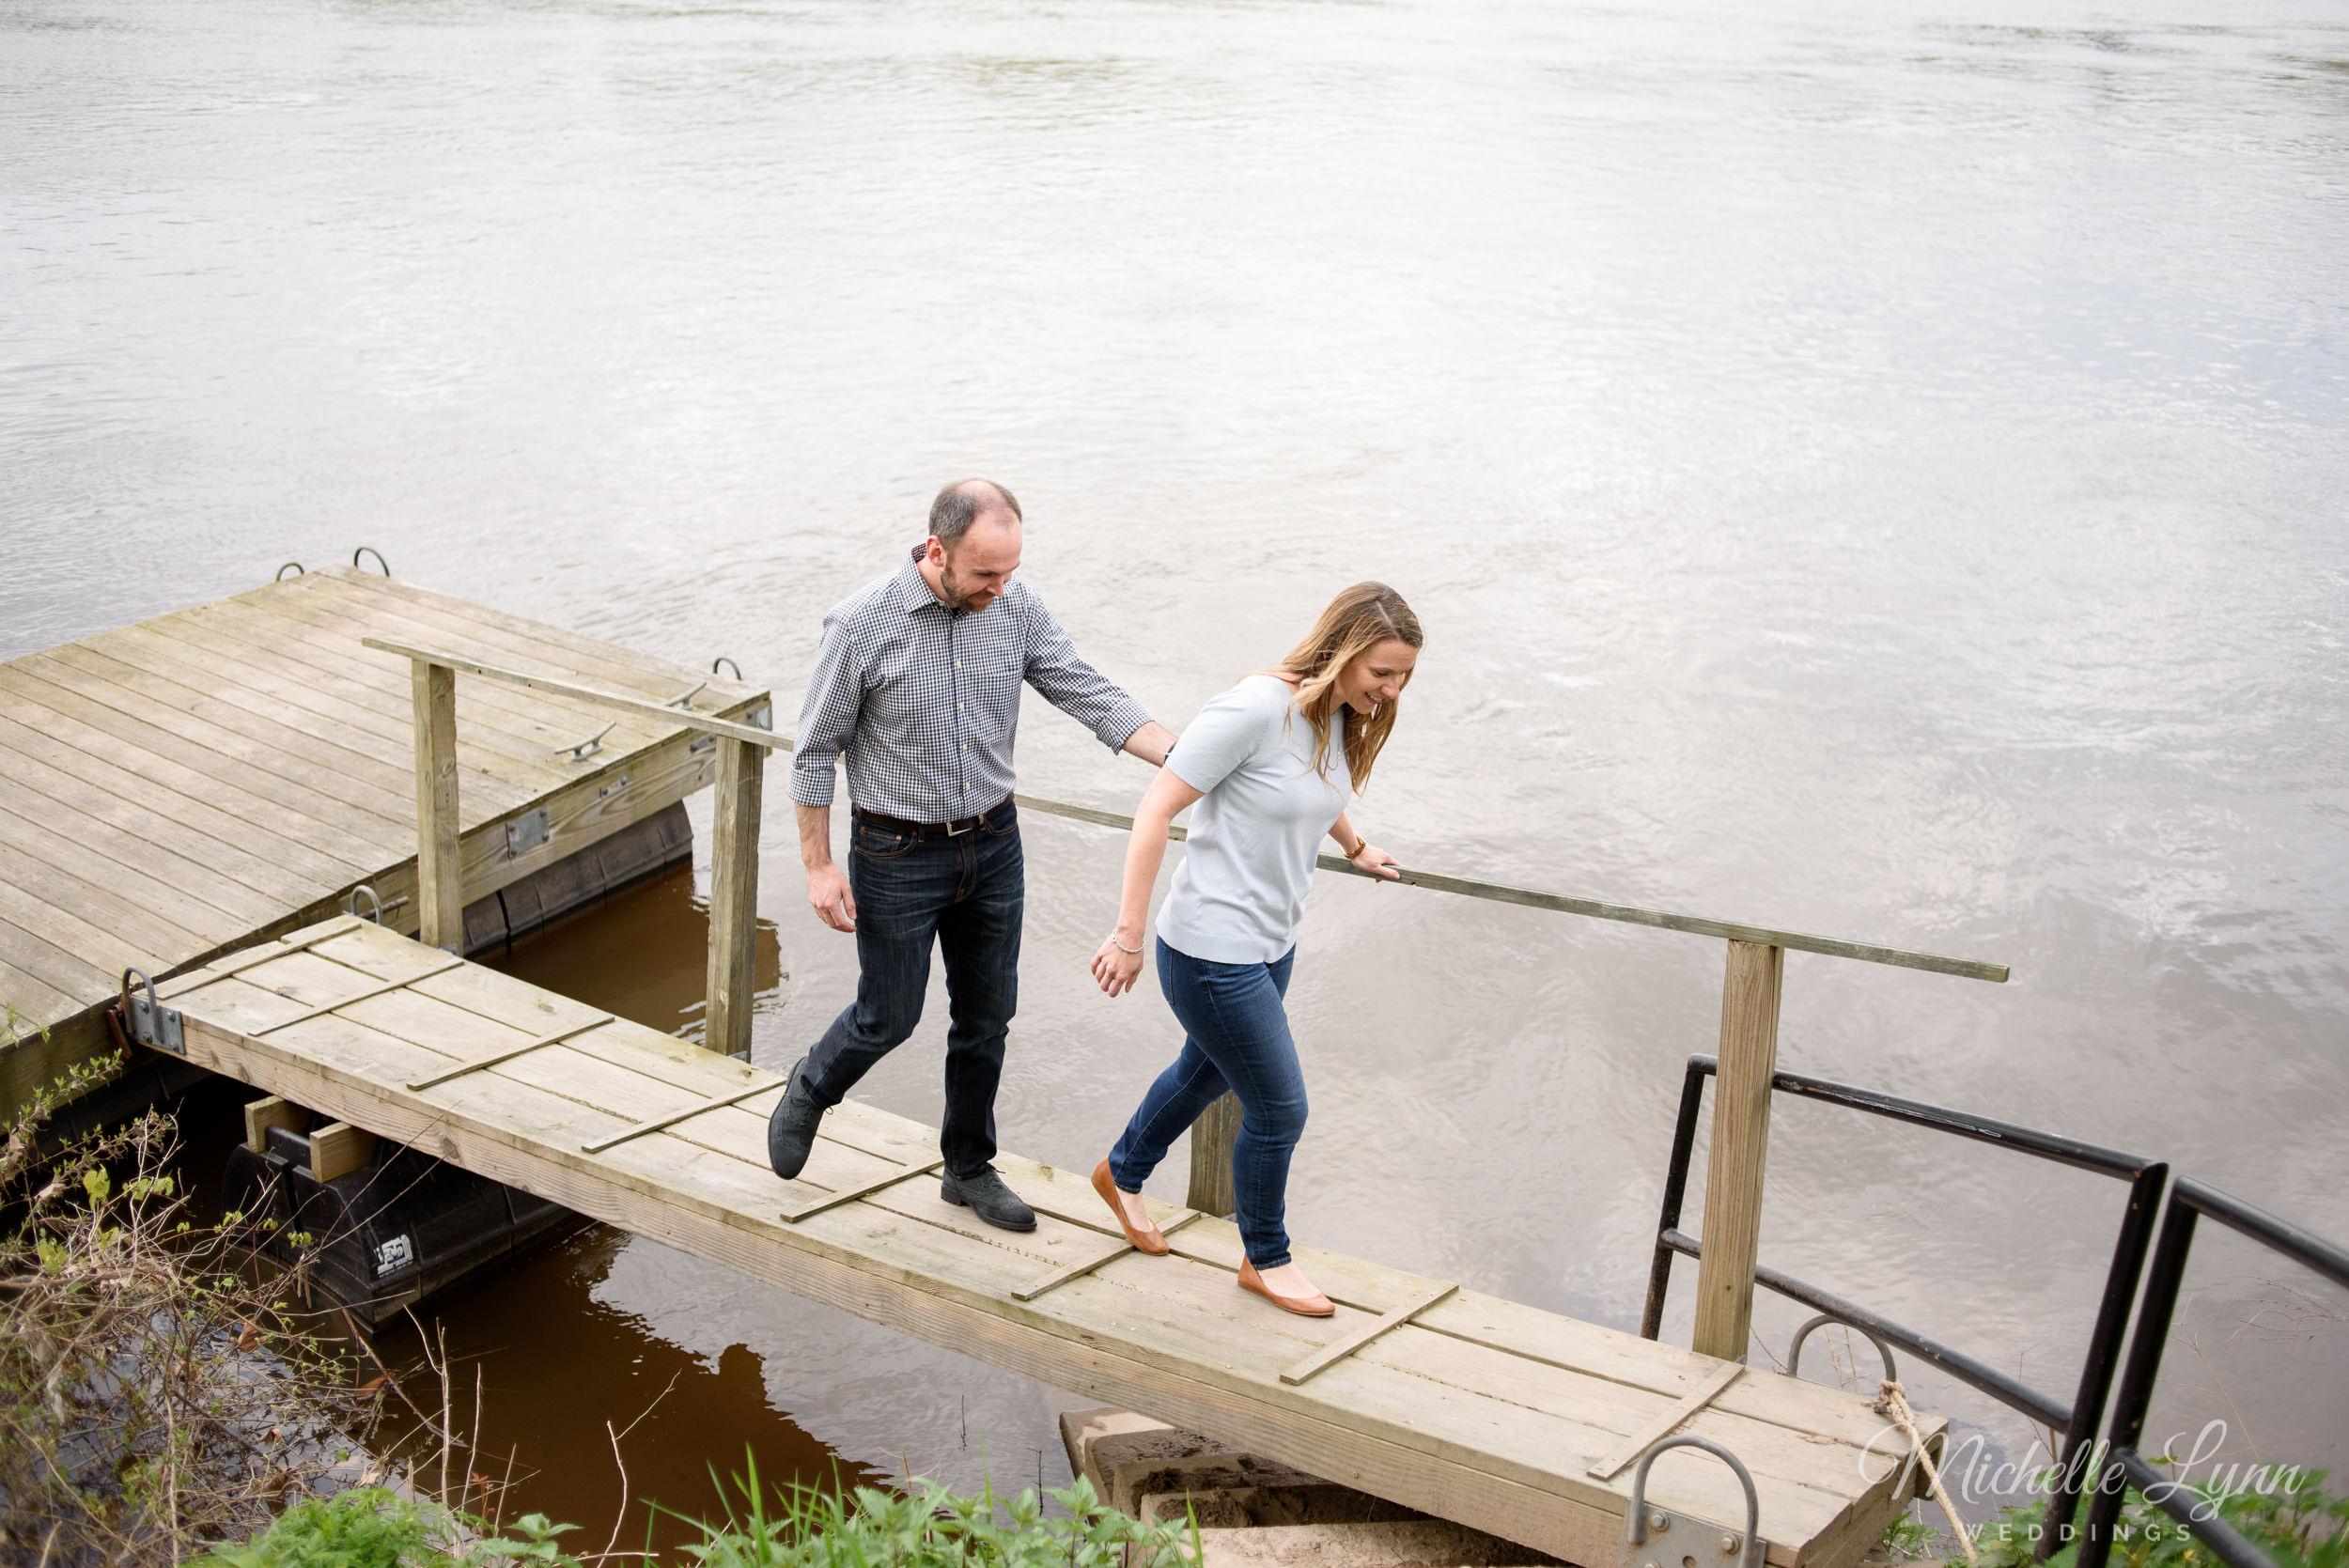 mlw-washingtons-crossing-pennsylvania-engagement-photos-17.jpg